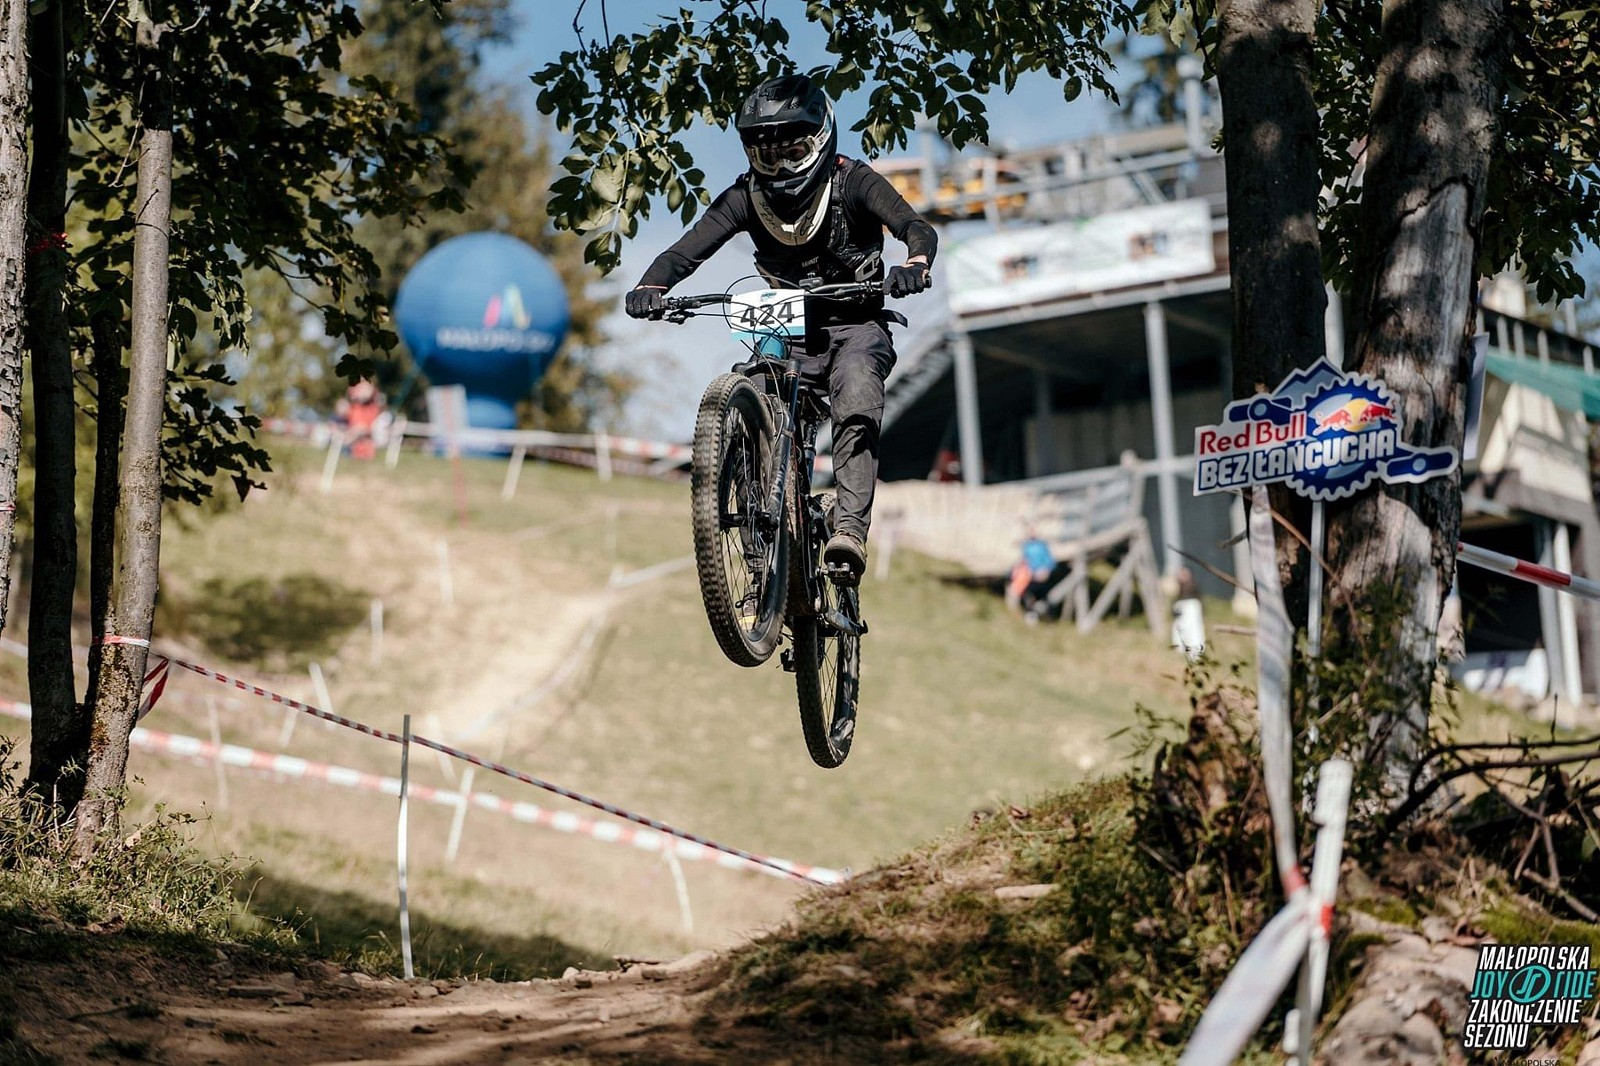 Joy Ride Zakopane 4 - bartek_zgr - Mountain Biking Pictures - Vital MTB